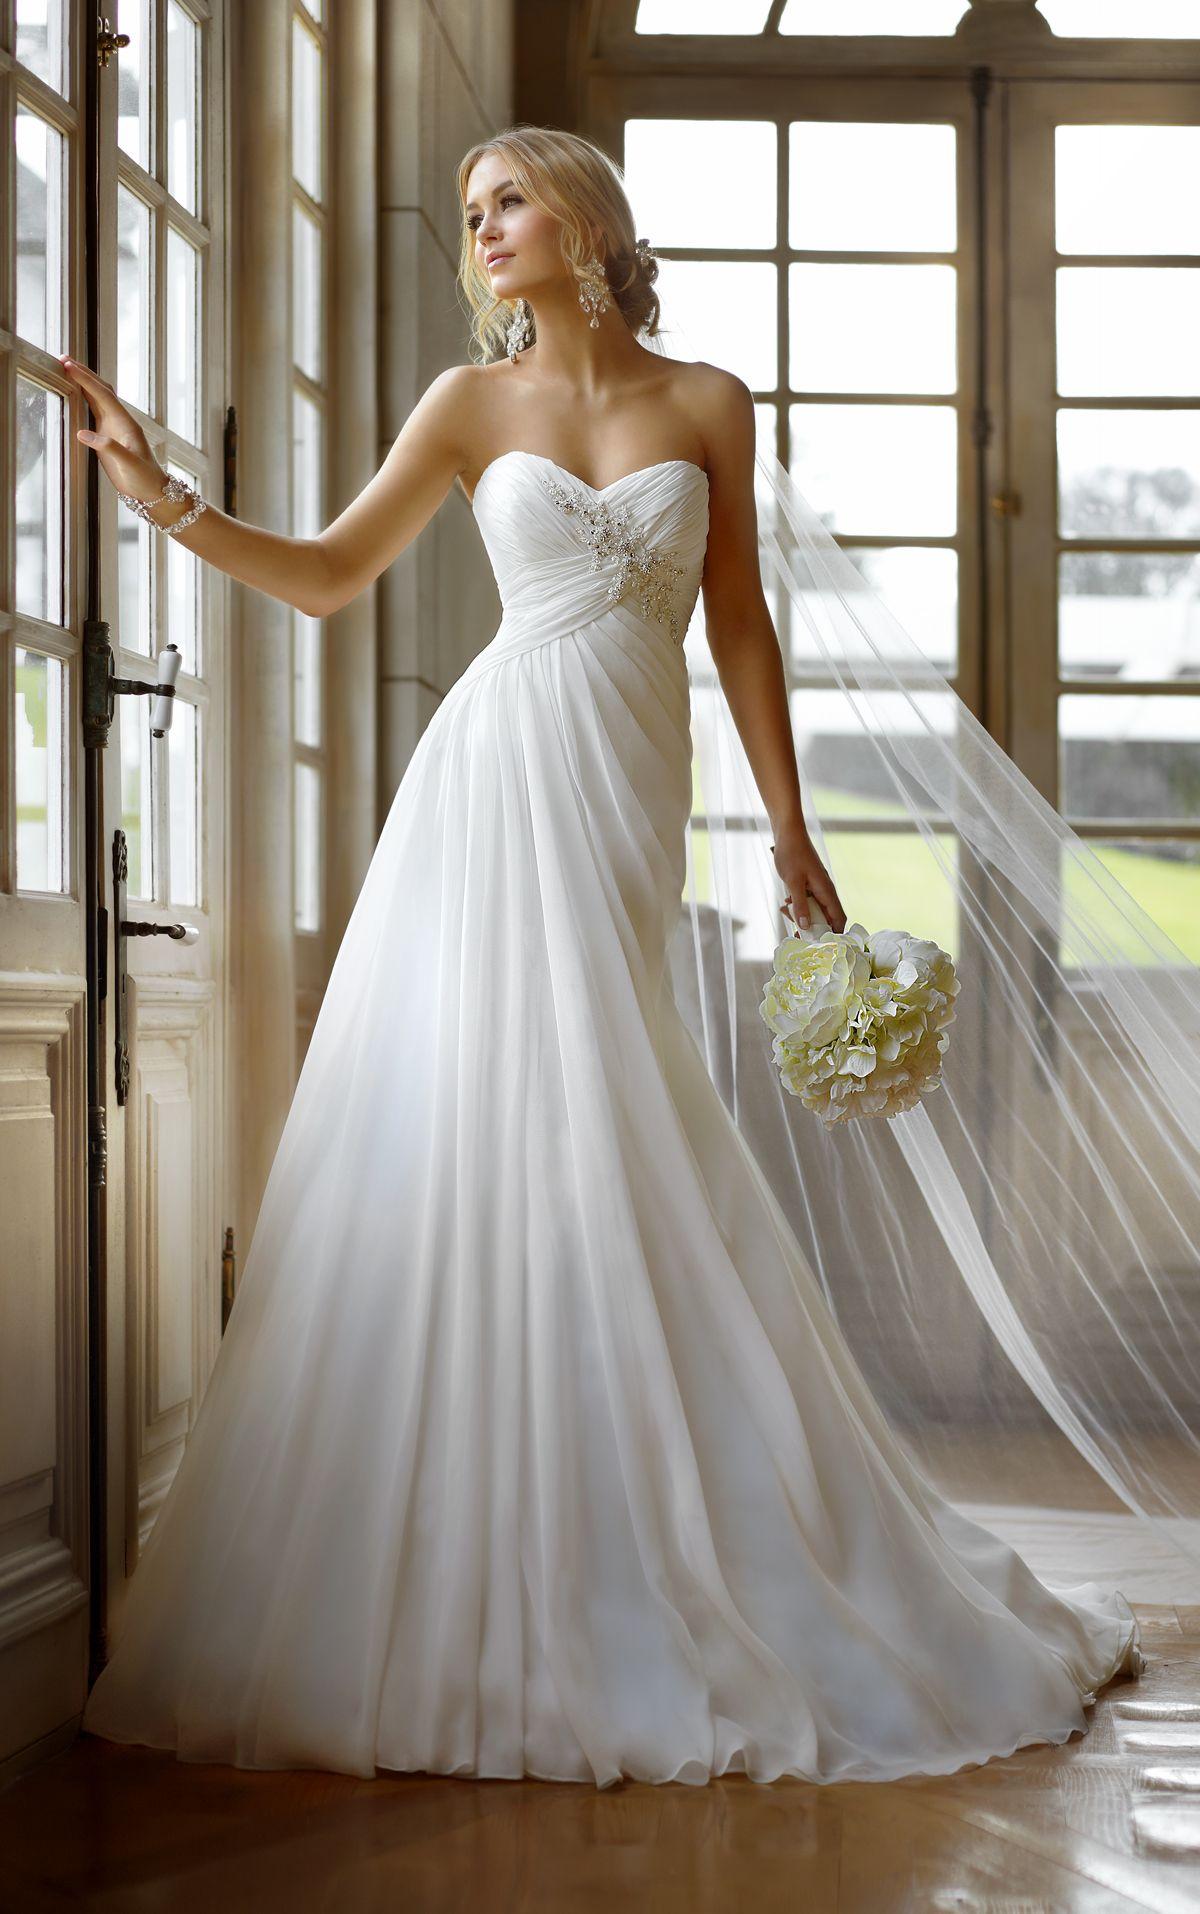 Dress for destination beach wedding guest  Marge Long margaritalargo on Pinterest